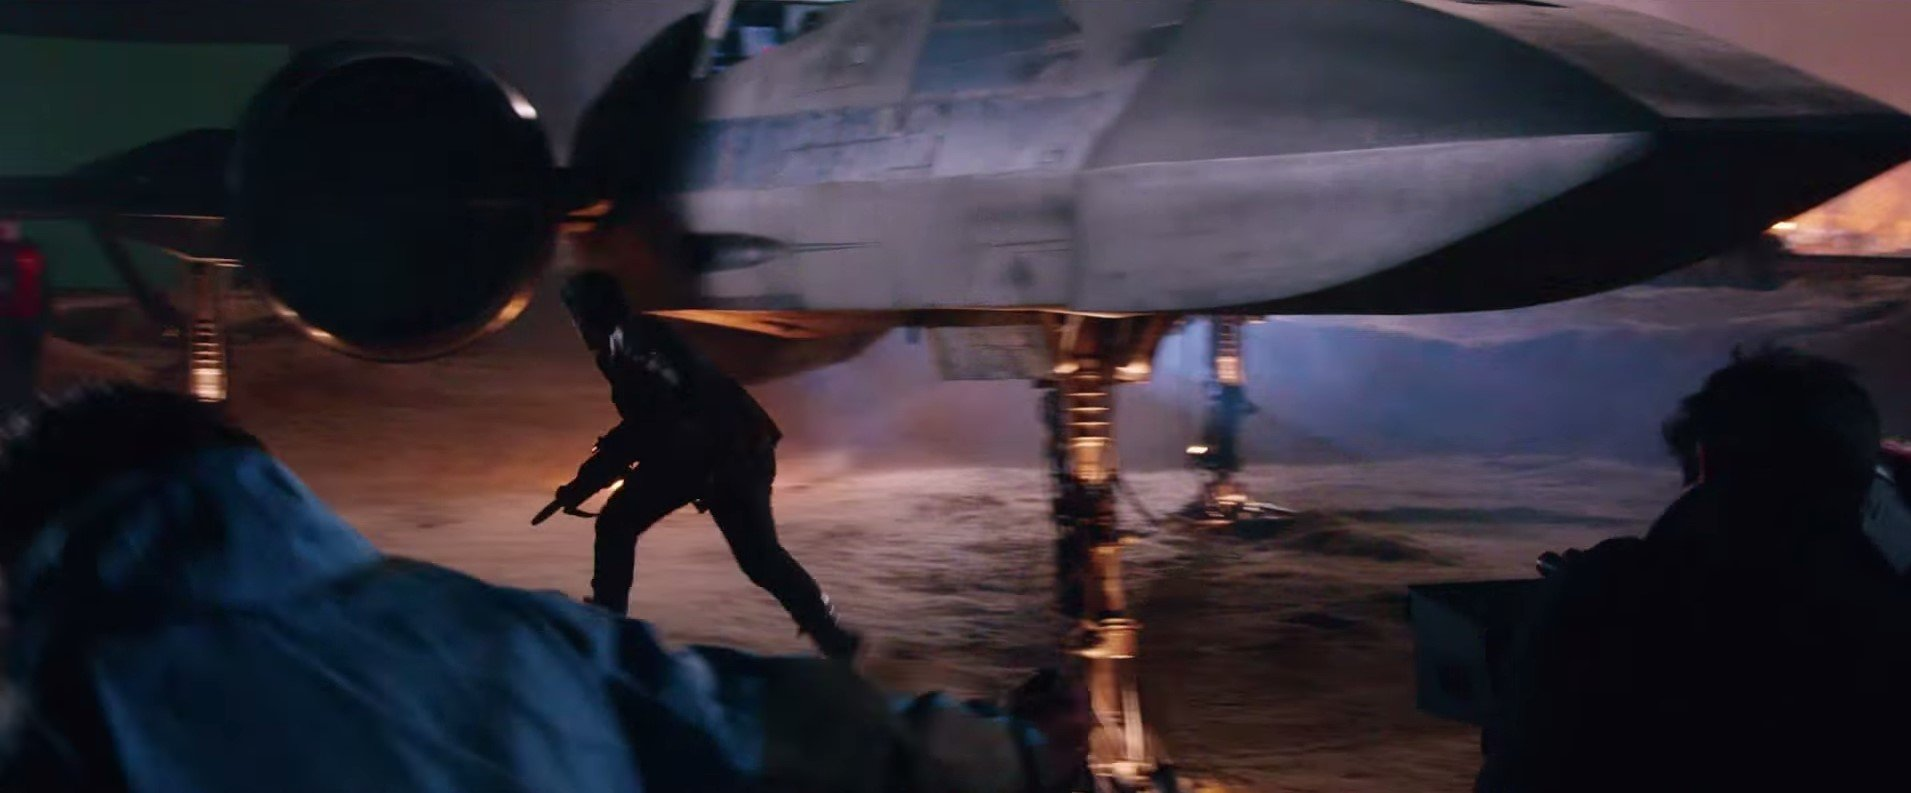 24 Oscar Isaac and X-Wing